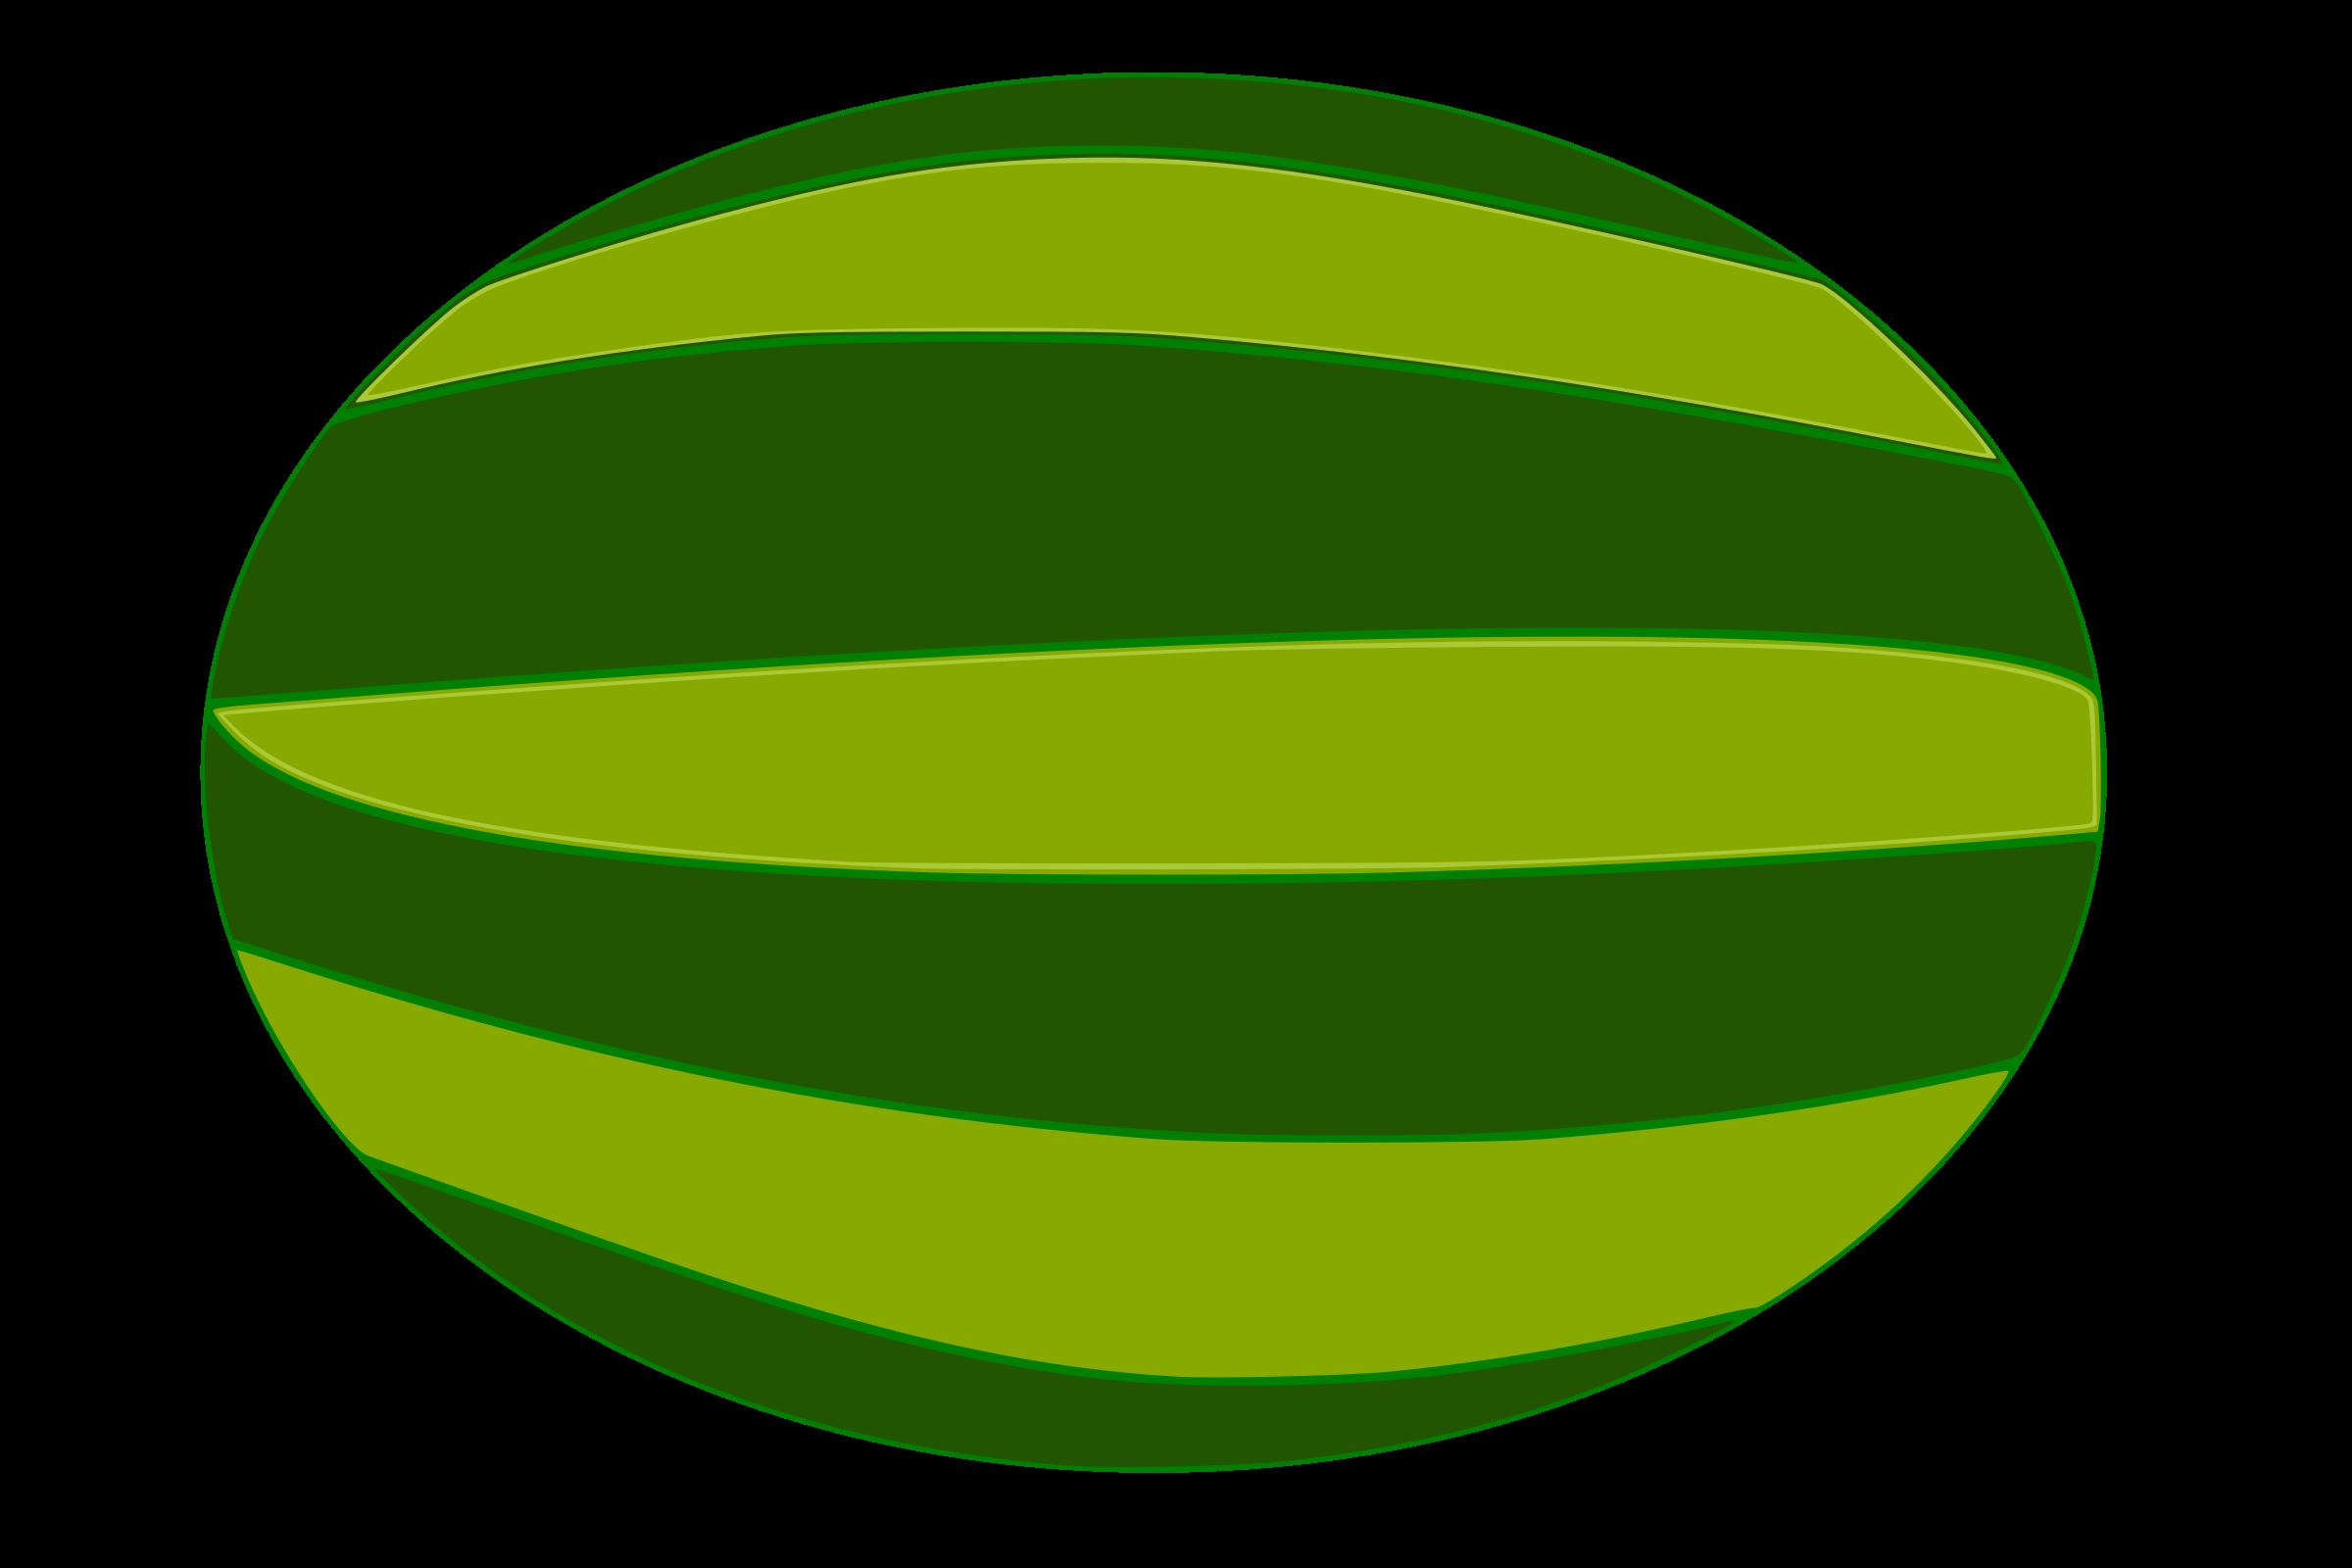 Big image png. Watermelon clipart leaf